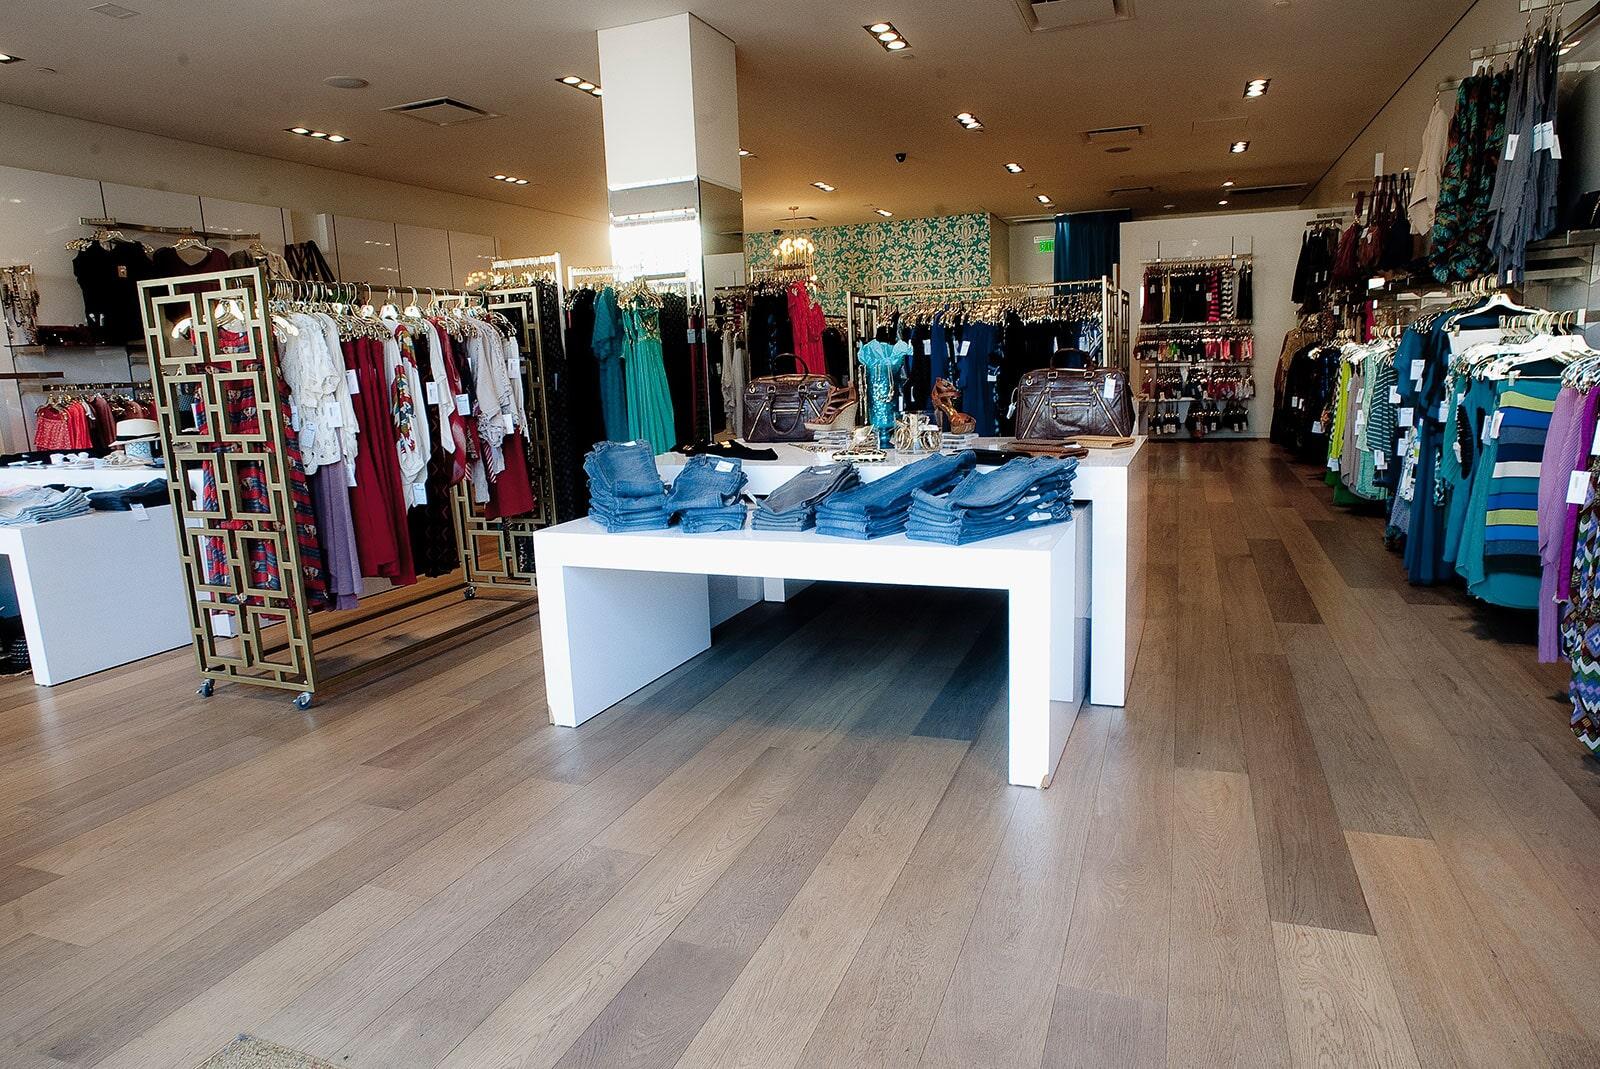 The New York, NY area's best hardwood flooring store is Sota Floors